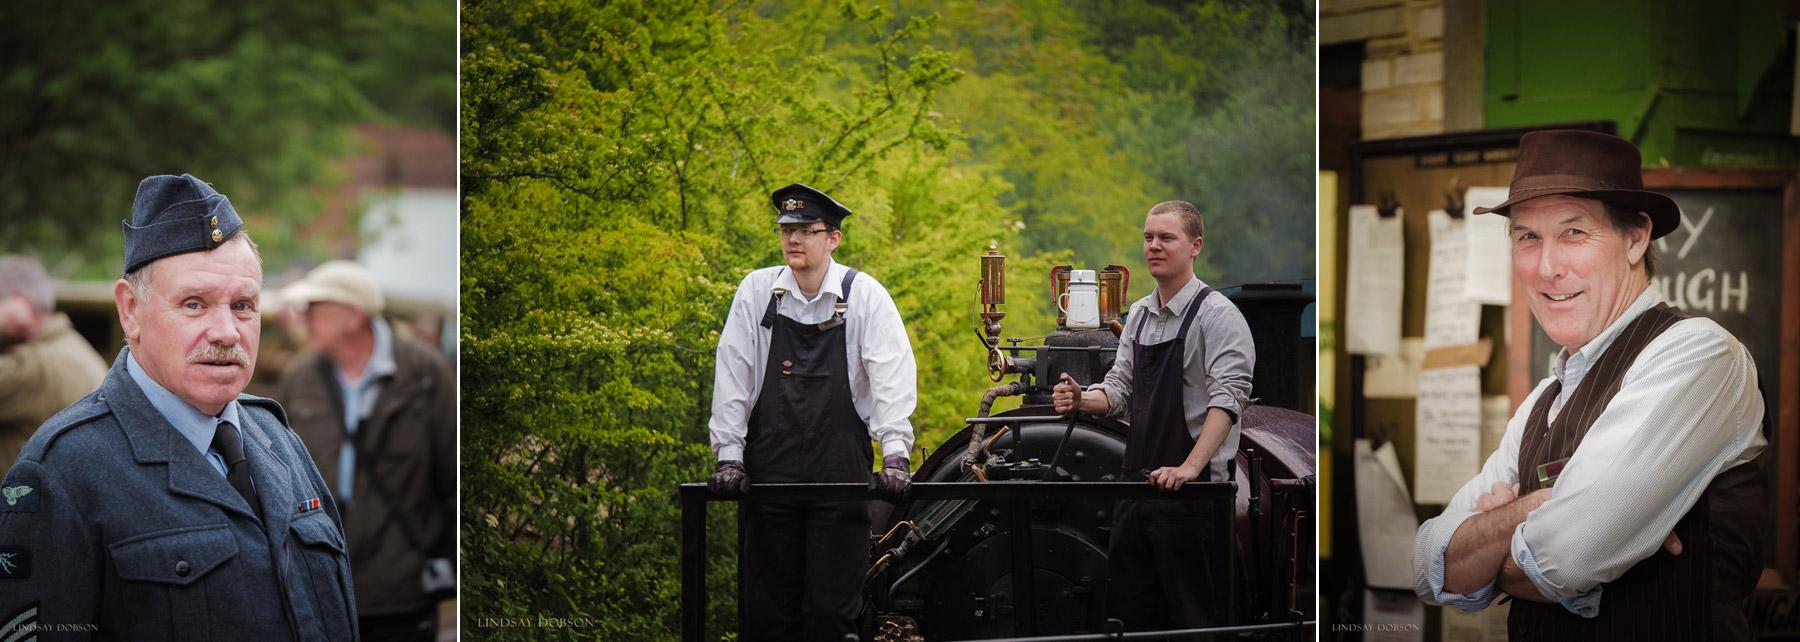 amberley-chalkpits-museum-military-reenactments.jpg